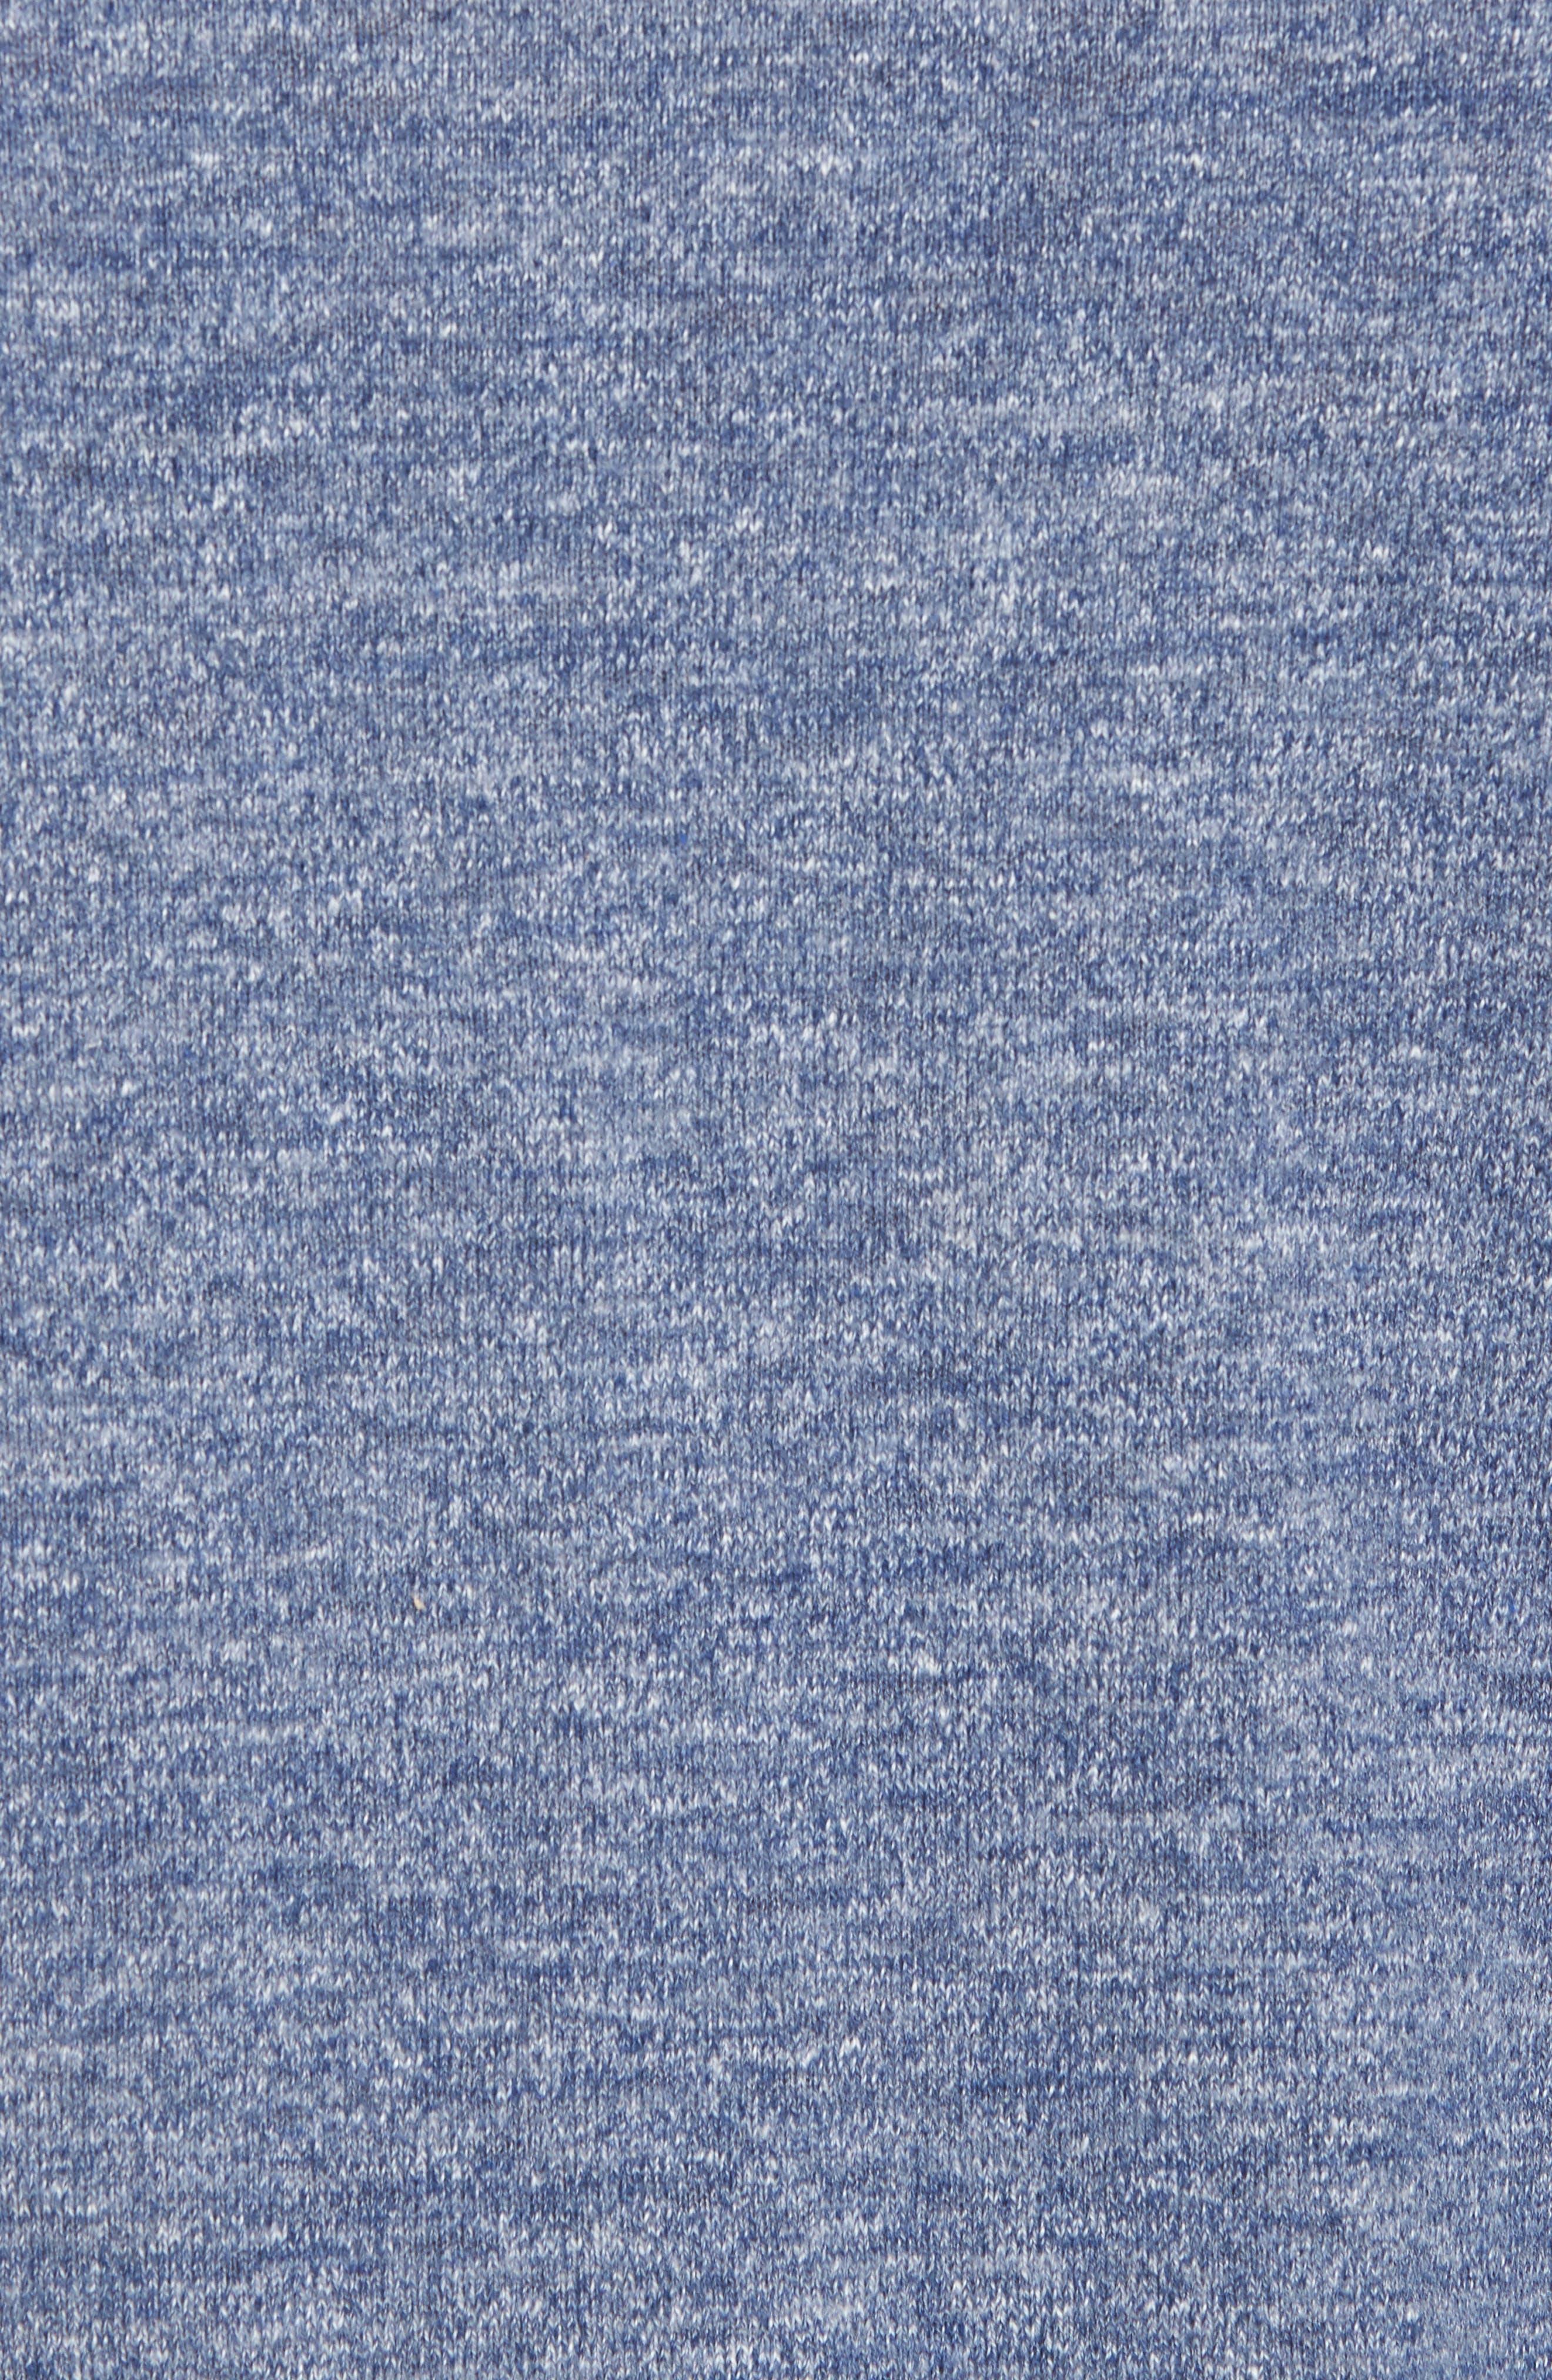 Arbors Cotton V-Neck Sweater,                             Alternate thumbnail 5, color,                             Riviera